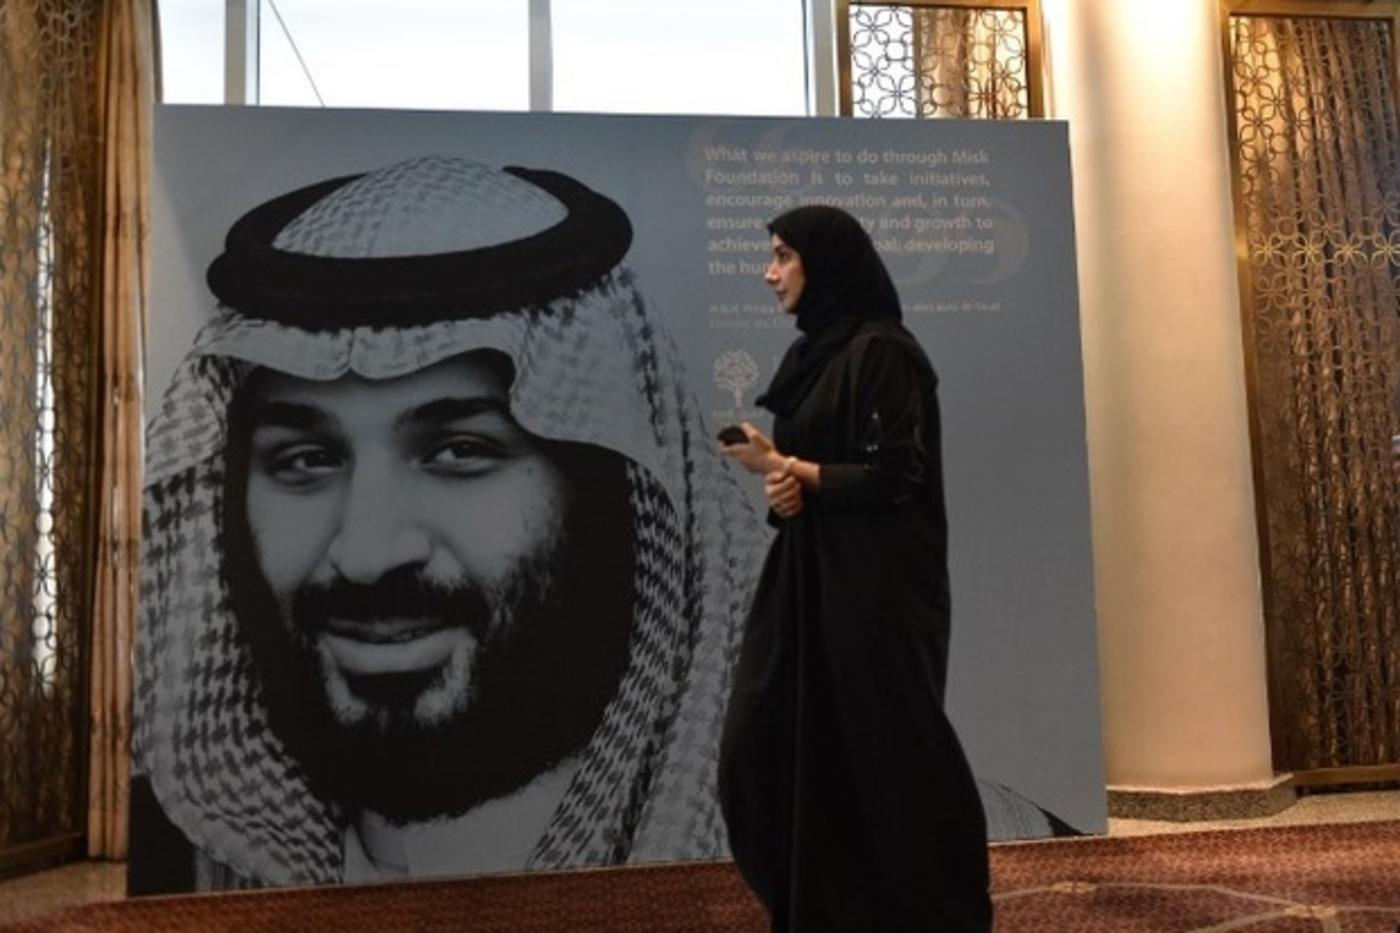 rencontre femmes arabie saoudite rencontrer femme gothique